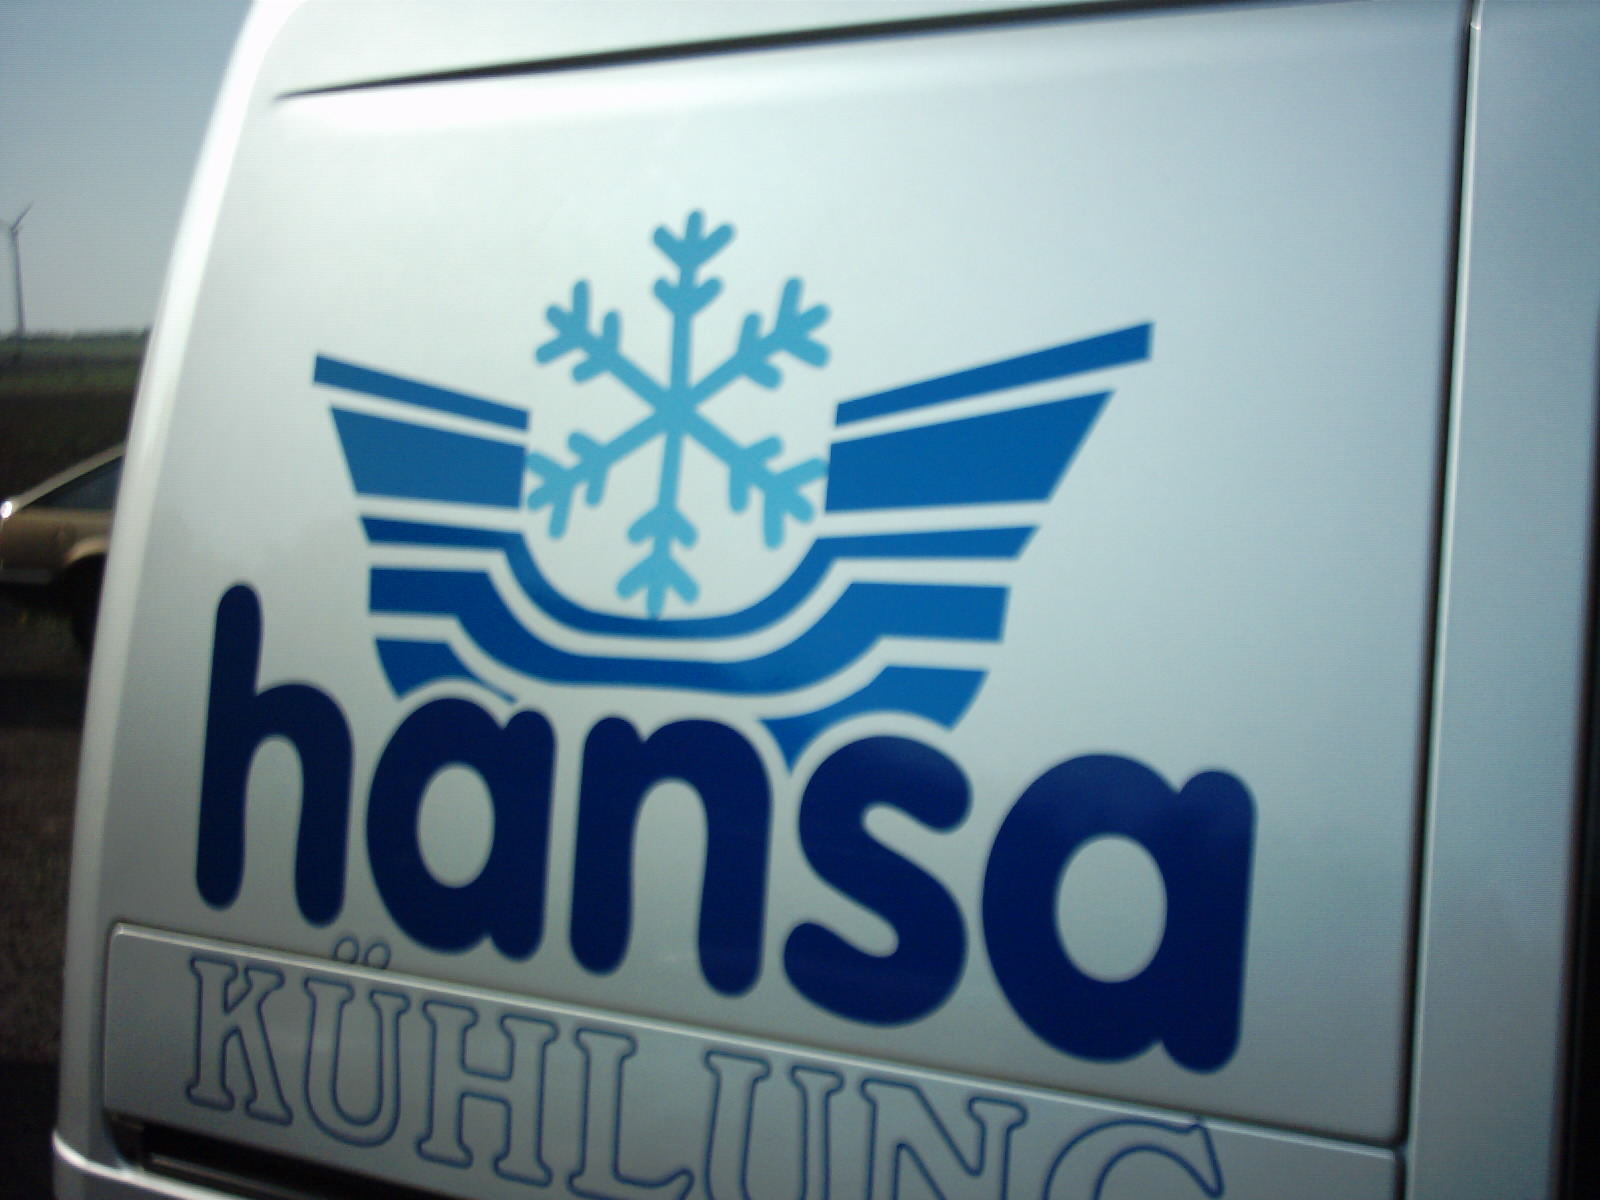 Fahrzeugbeschriftung 5 fahrzeugbeschriftung Fahrzeugbeschriftung Hansa02